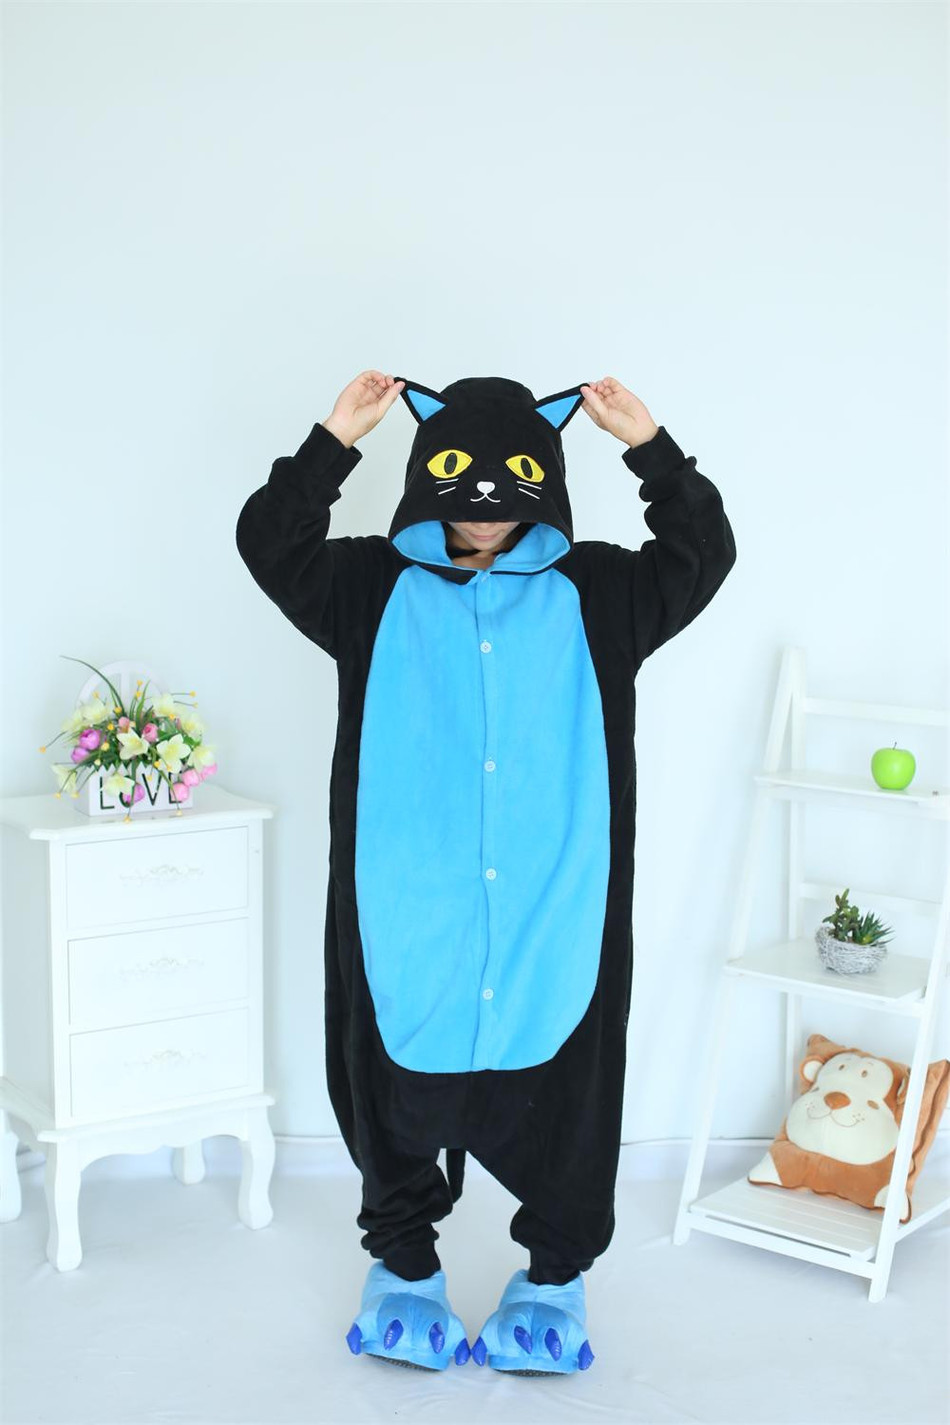 Cosplay Kostym Midnatt Katt Onesies Svart Katt Pyjamas För Unisex Vuxen Pyjamas Kostym Animal Onesie Sleepwear